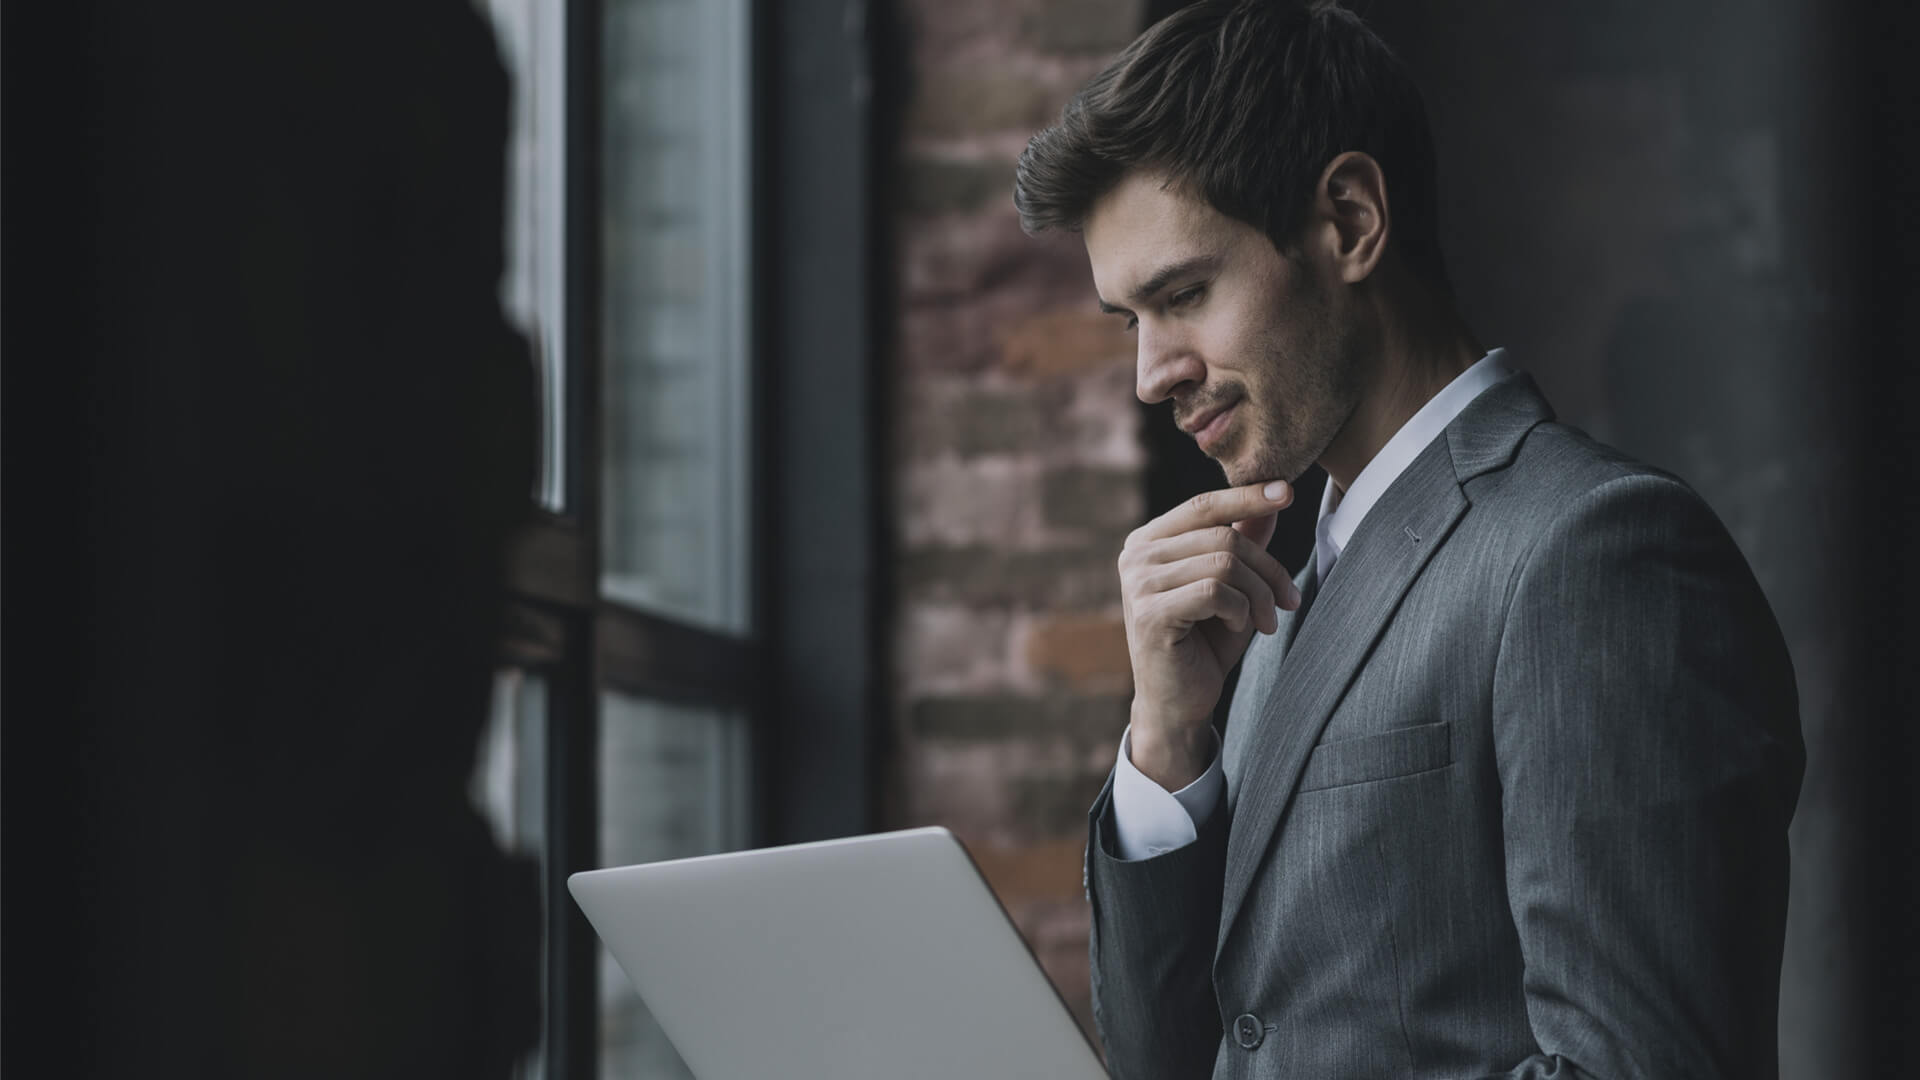 Client-Focused Legal Services